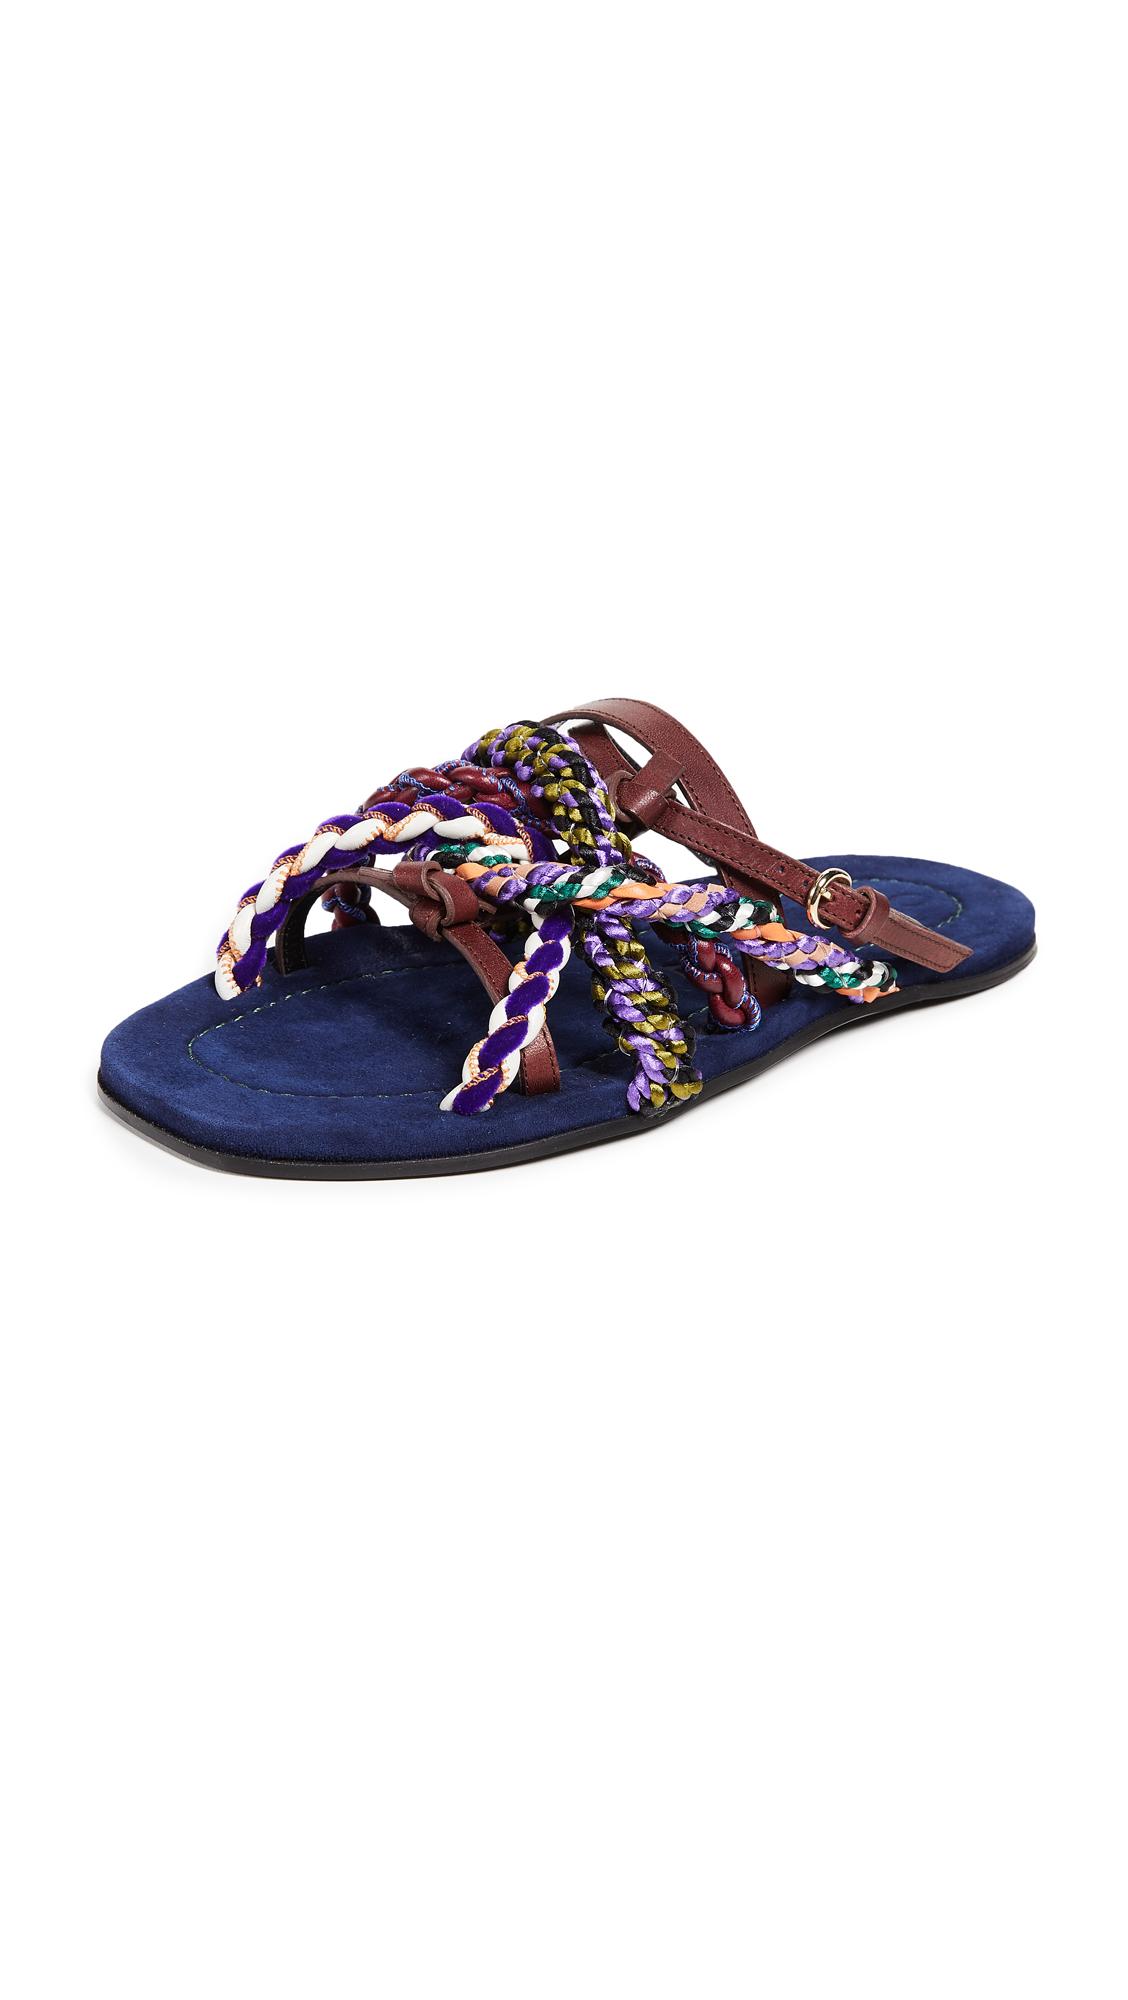 Carven Turenne Slip On Sandals - Bordeaux